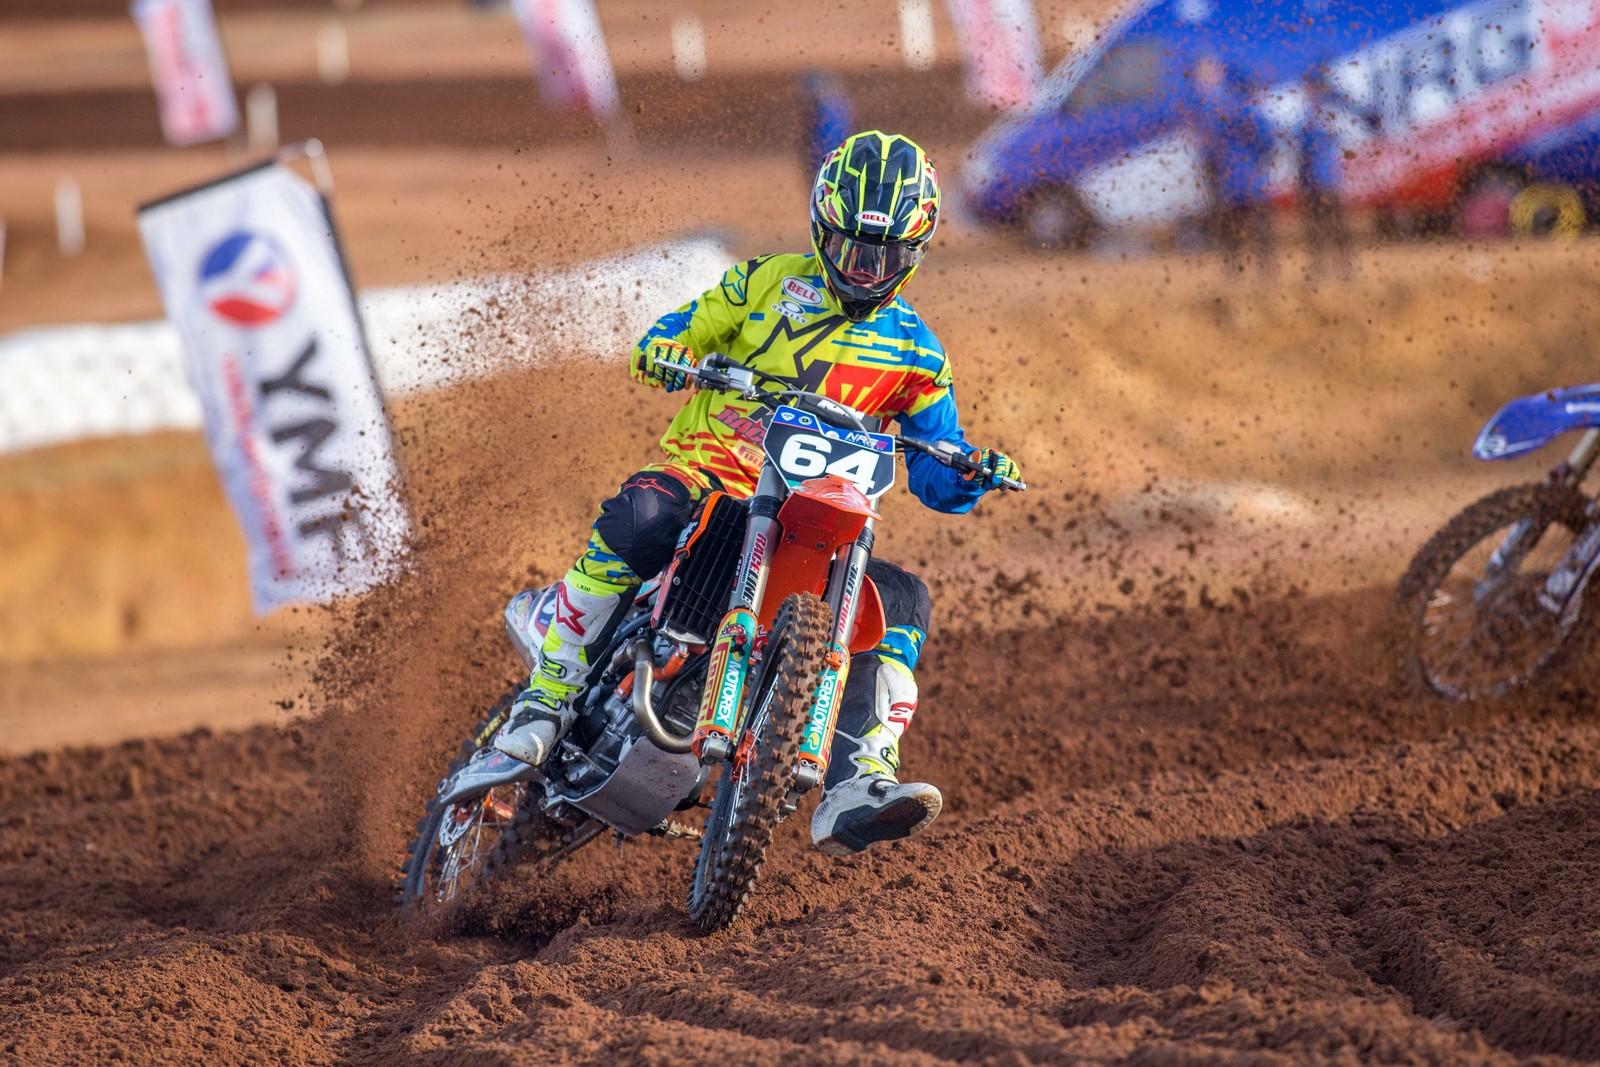 Dylan Wills - Australian Motul Mx Championships: Round 4, Murray Bridge - Motocross Pictures - Vital MX